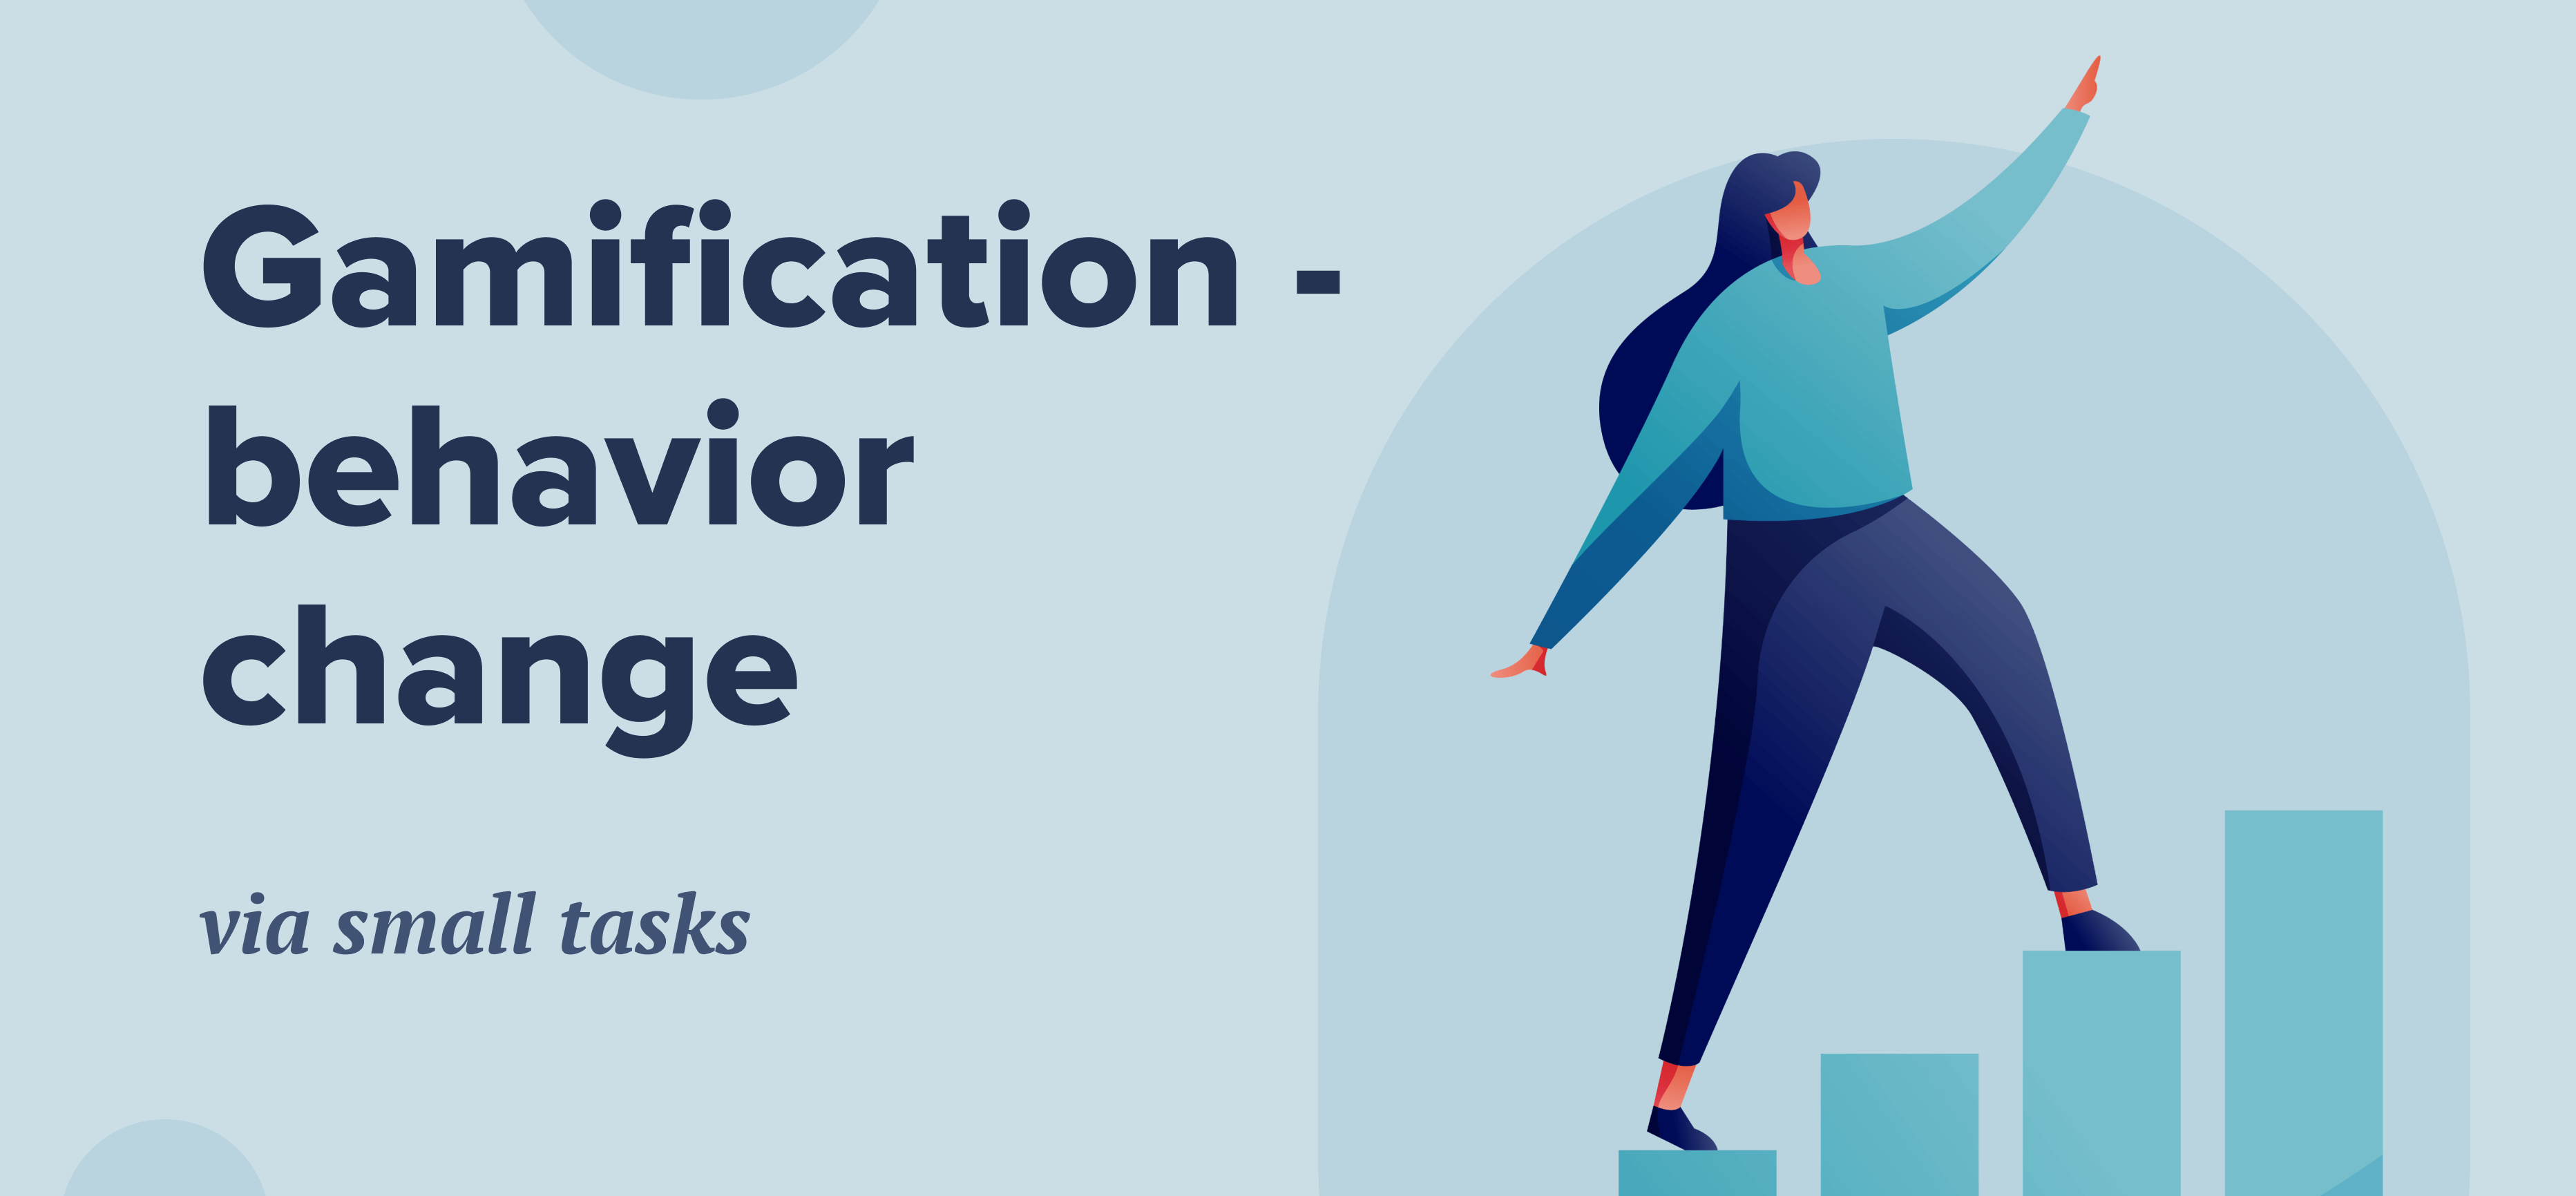 Gamification - behavior change via small tasks